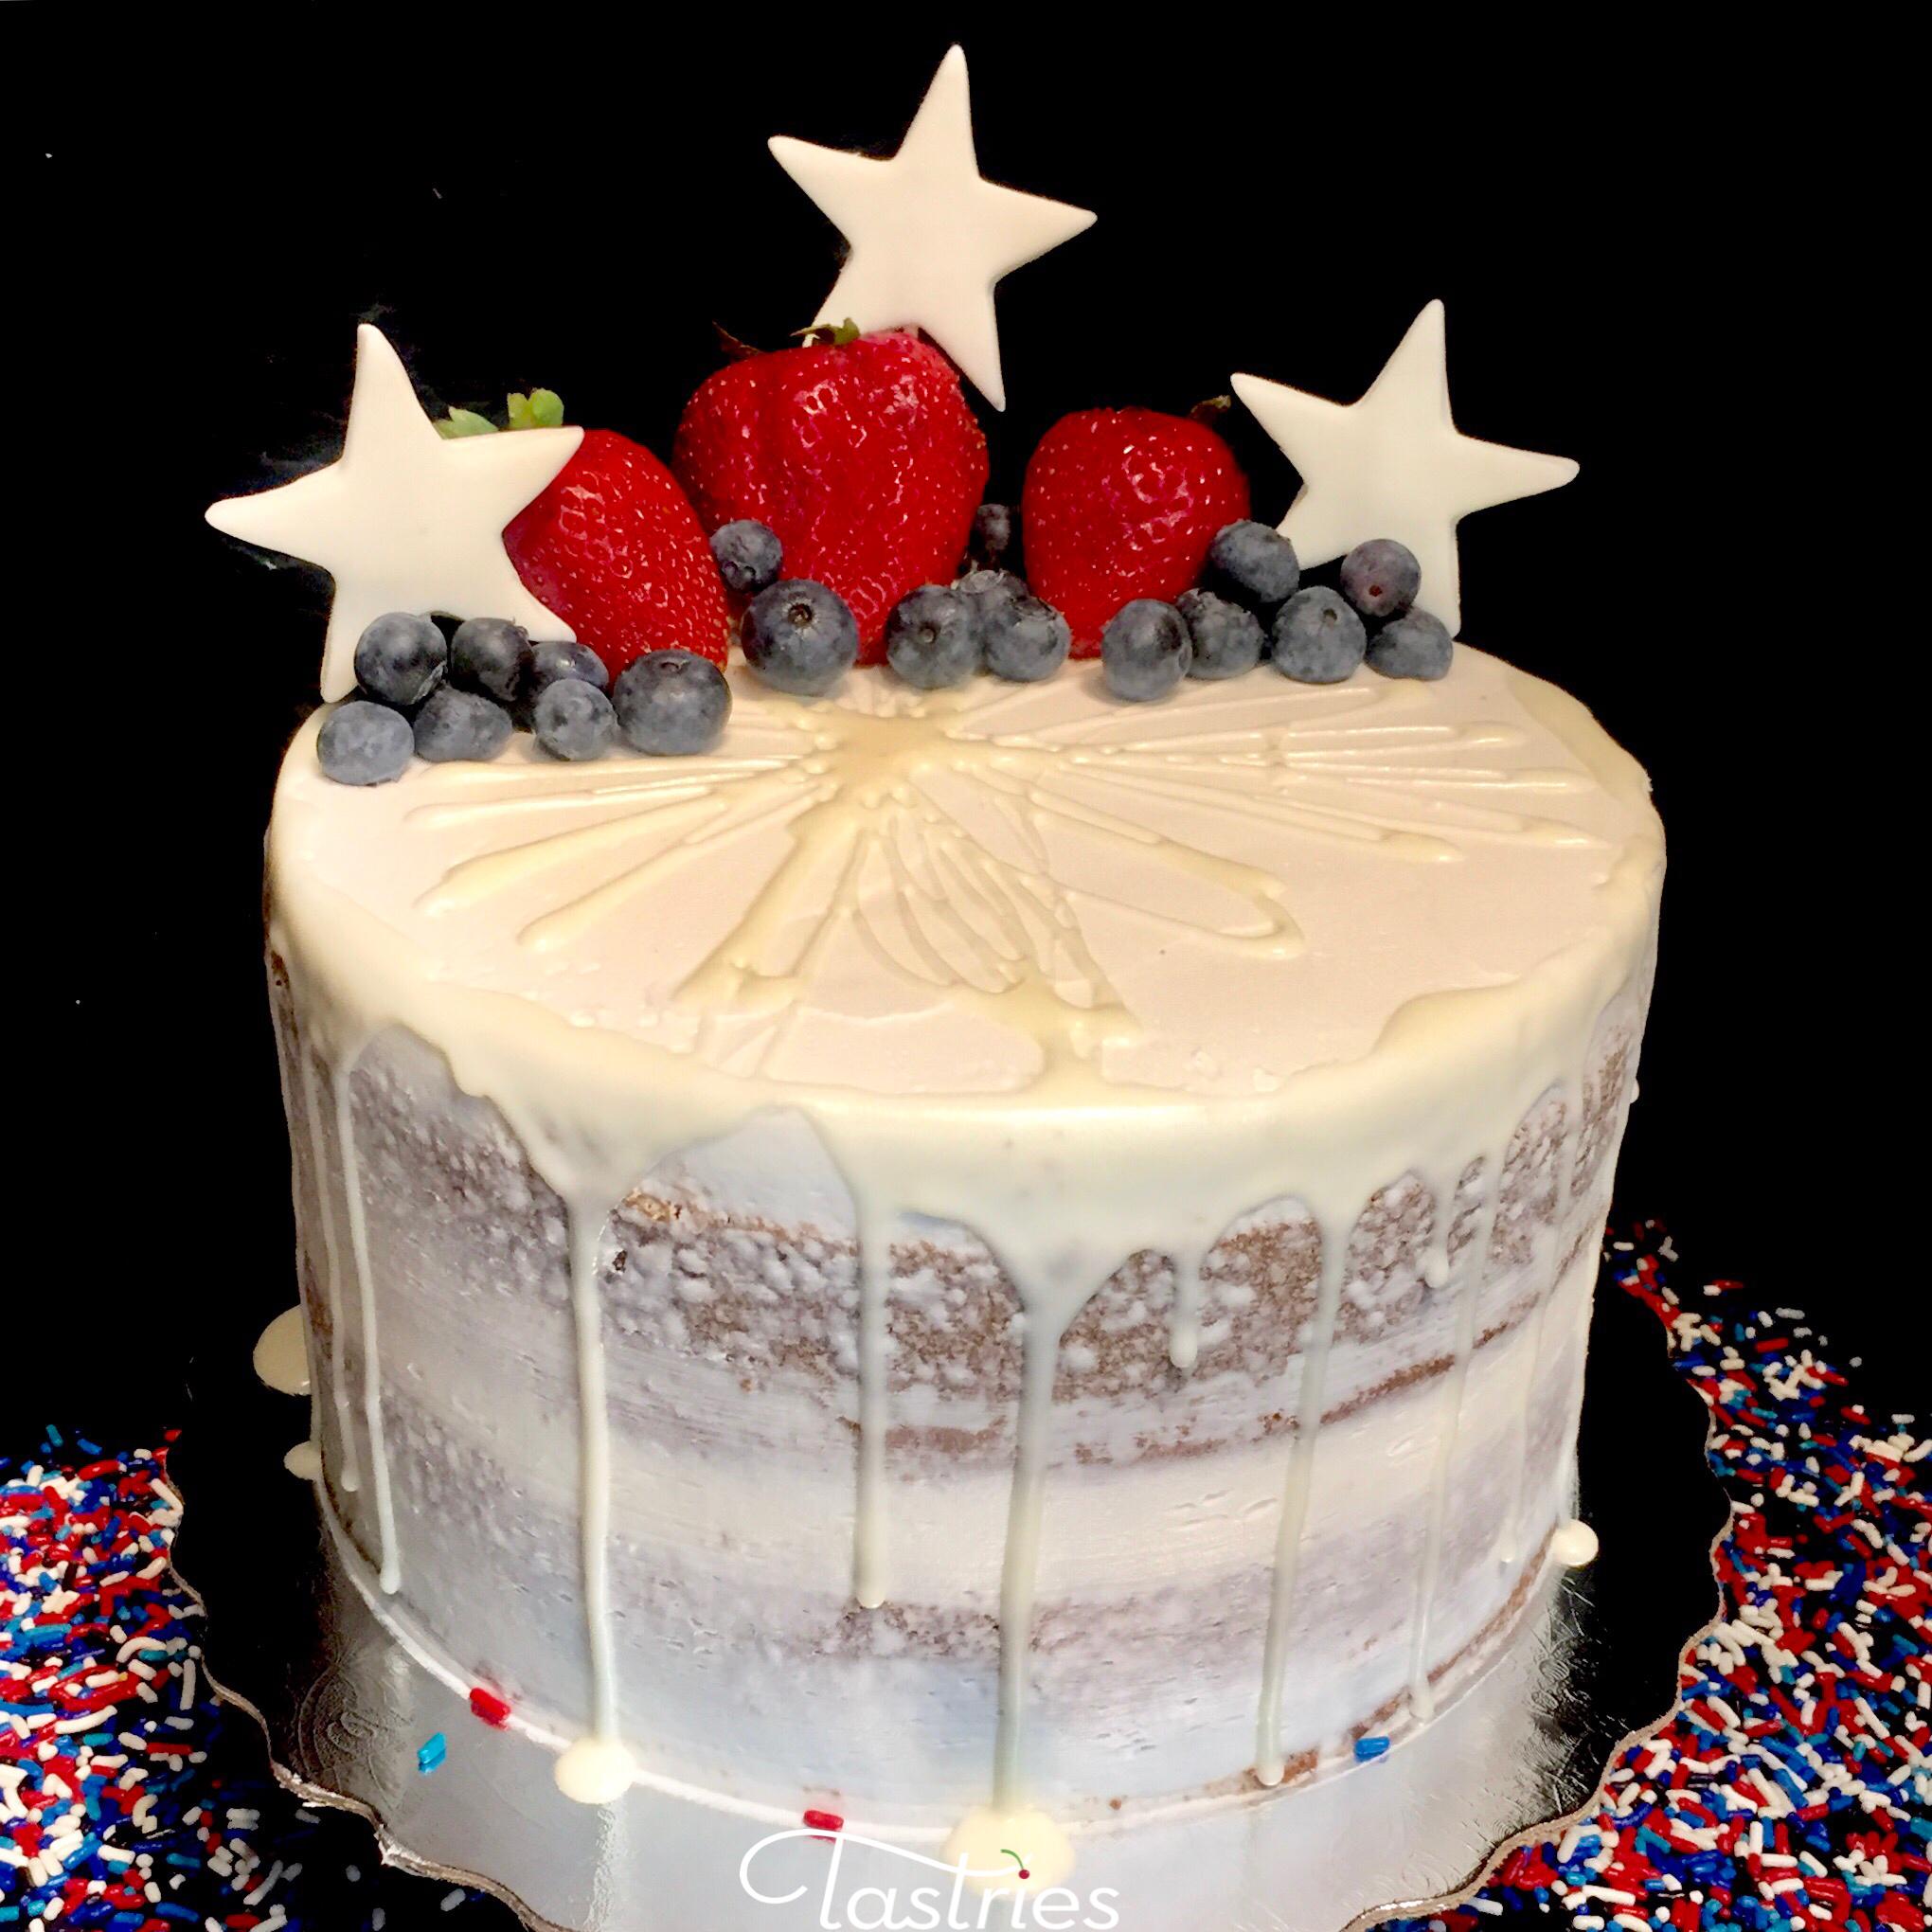 Patriotic Dessert Cake, 4th of July